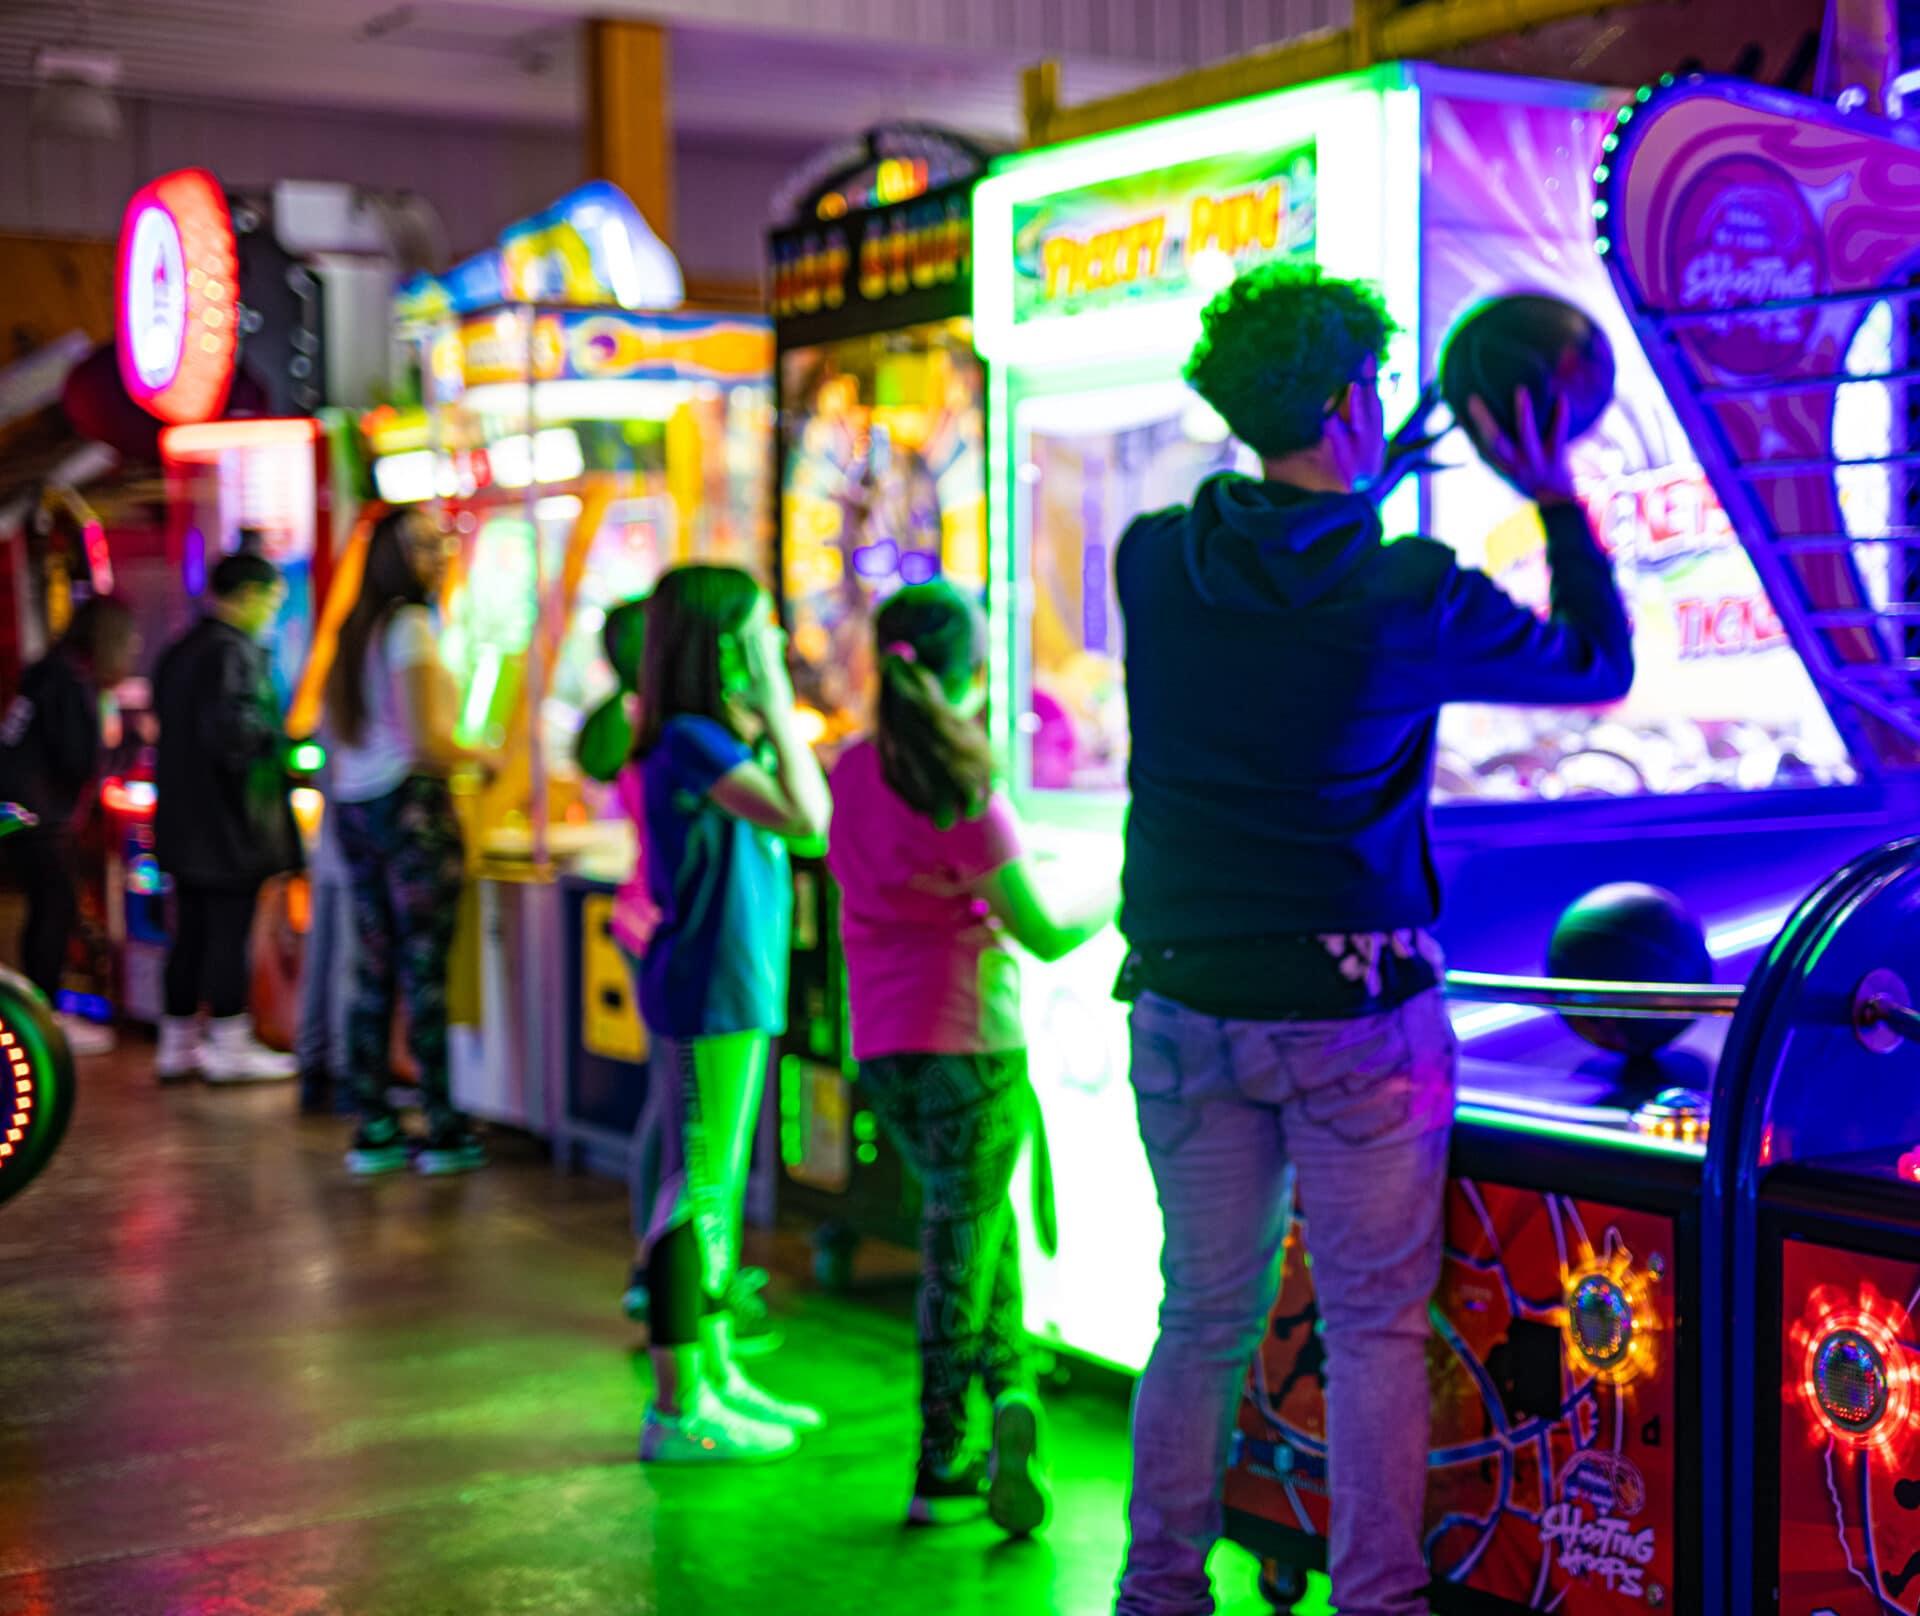 arcade in kenosha, kenosha amusement park, america's action territory